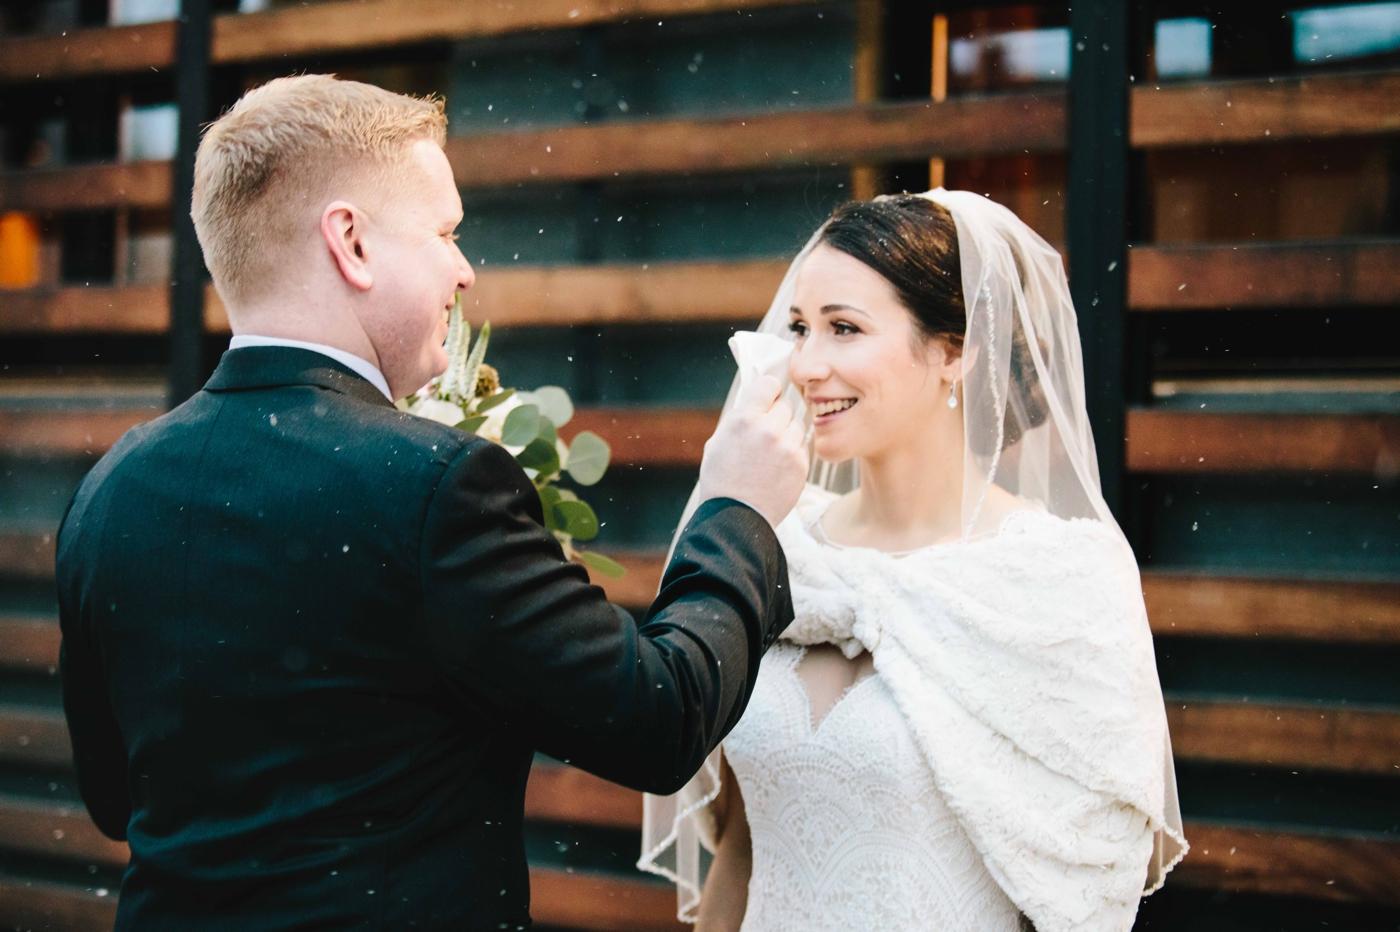 chicago-fine-art-wedding-photography-lintelman16